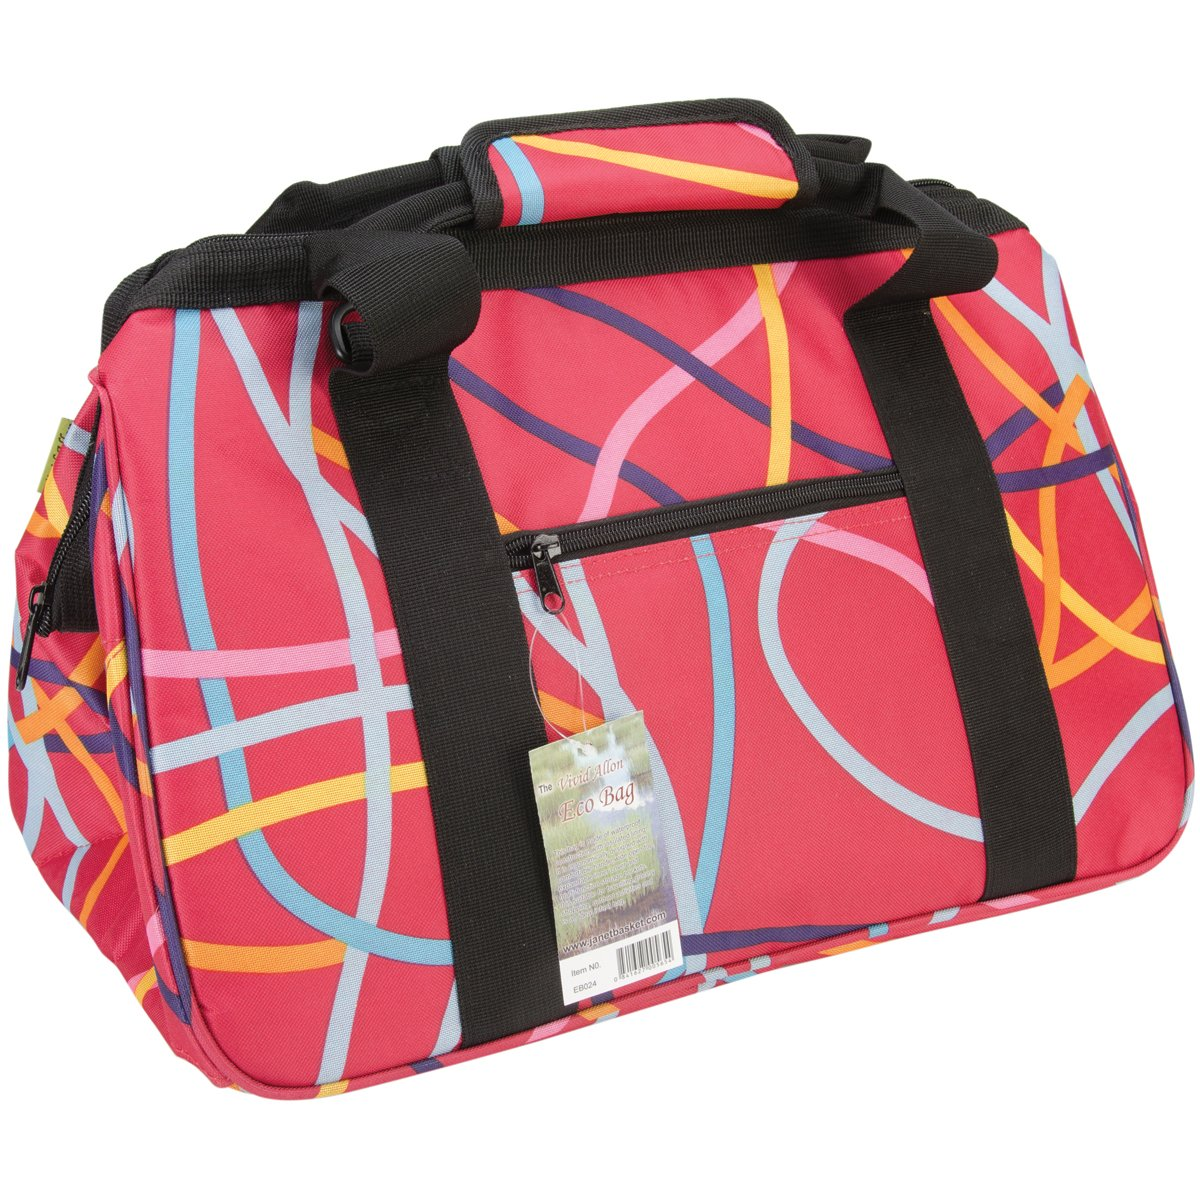 JanetBasket EB024 Eco Bag-18''X10''X12'' Ribbons